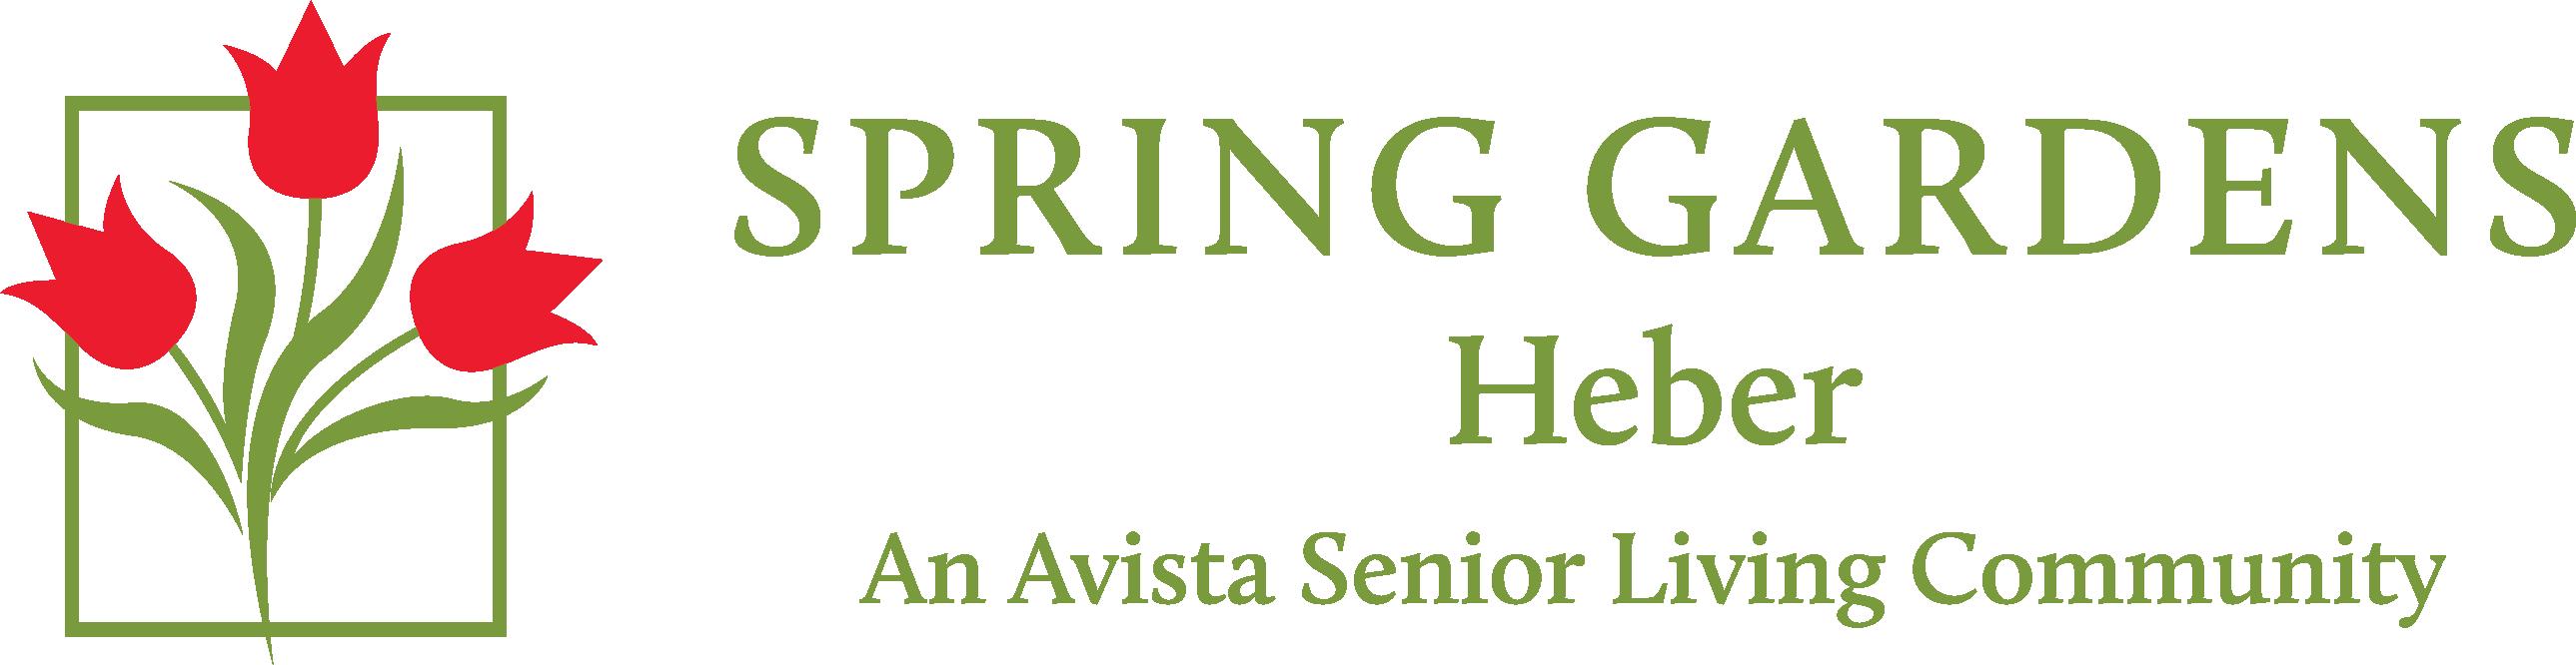 Spring Gardens Senior Living Community